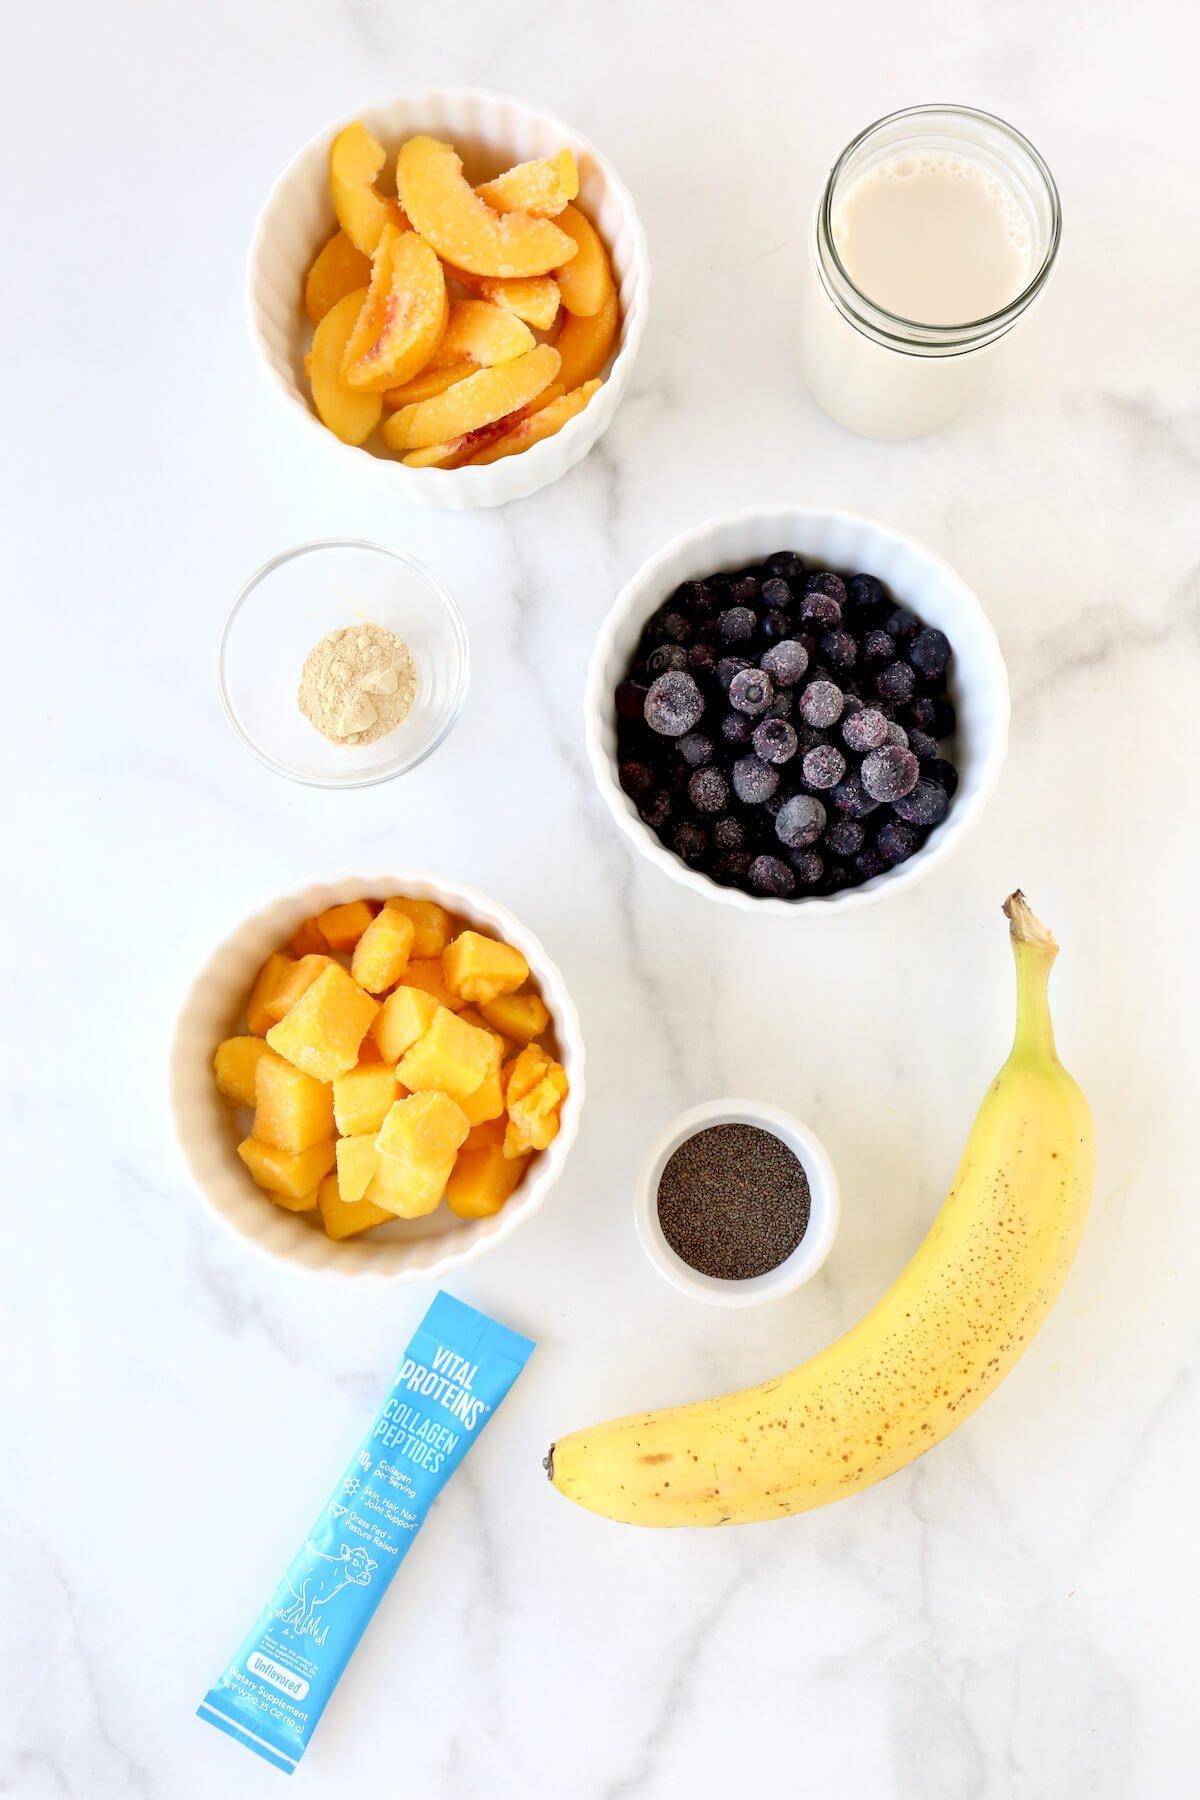 A bowl of frozen blueberries, frozen mango, frozen peaches, chia seeds, maca powder, a banana, vital proteins and a jar of almond milk.